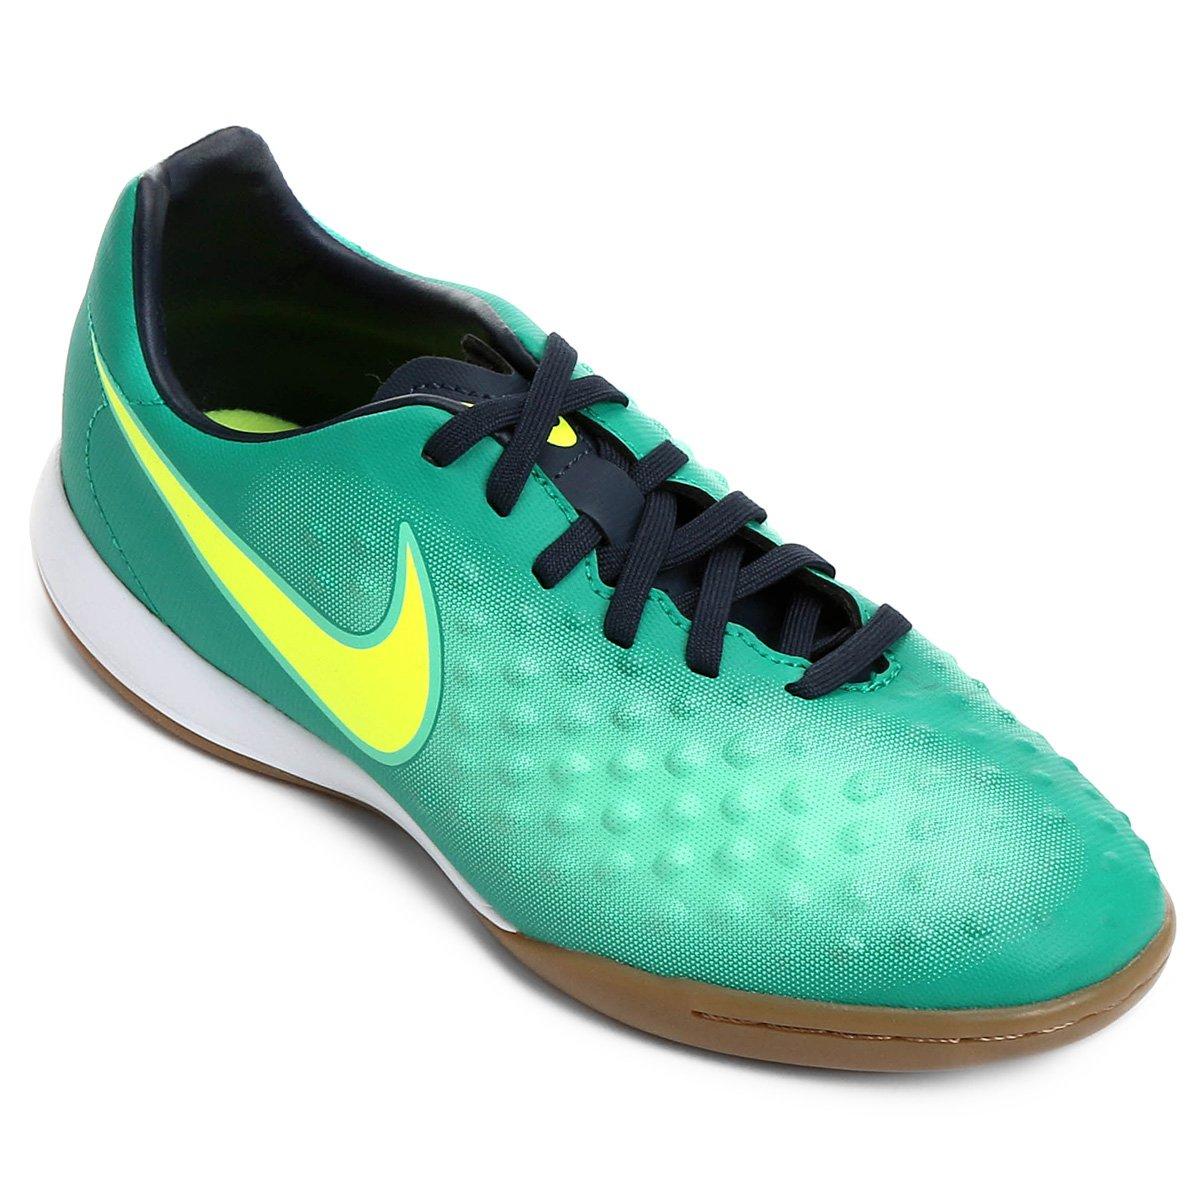 Chuteira Futsal Infantil Nike Magista Opus II IC - Compre Agora ... 9985964a4140d